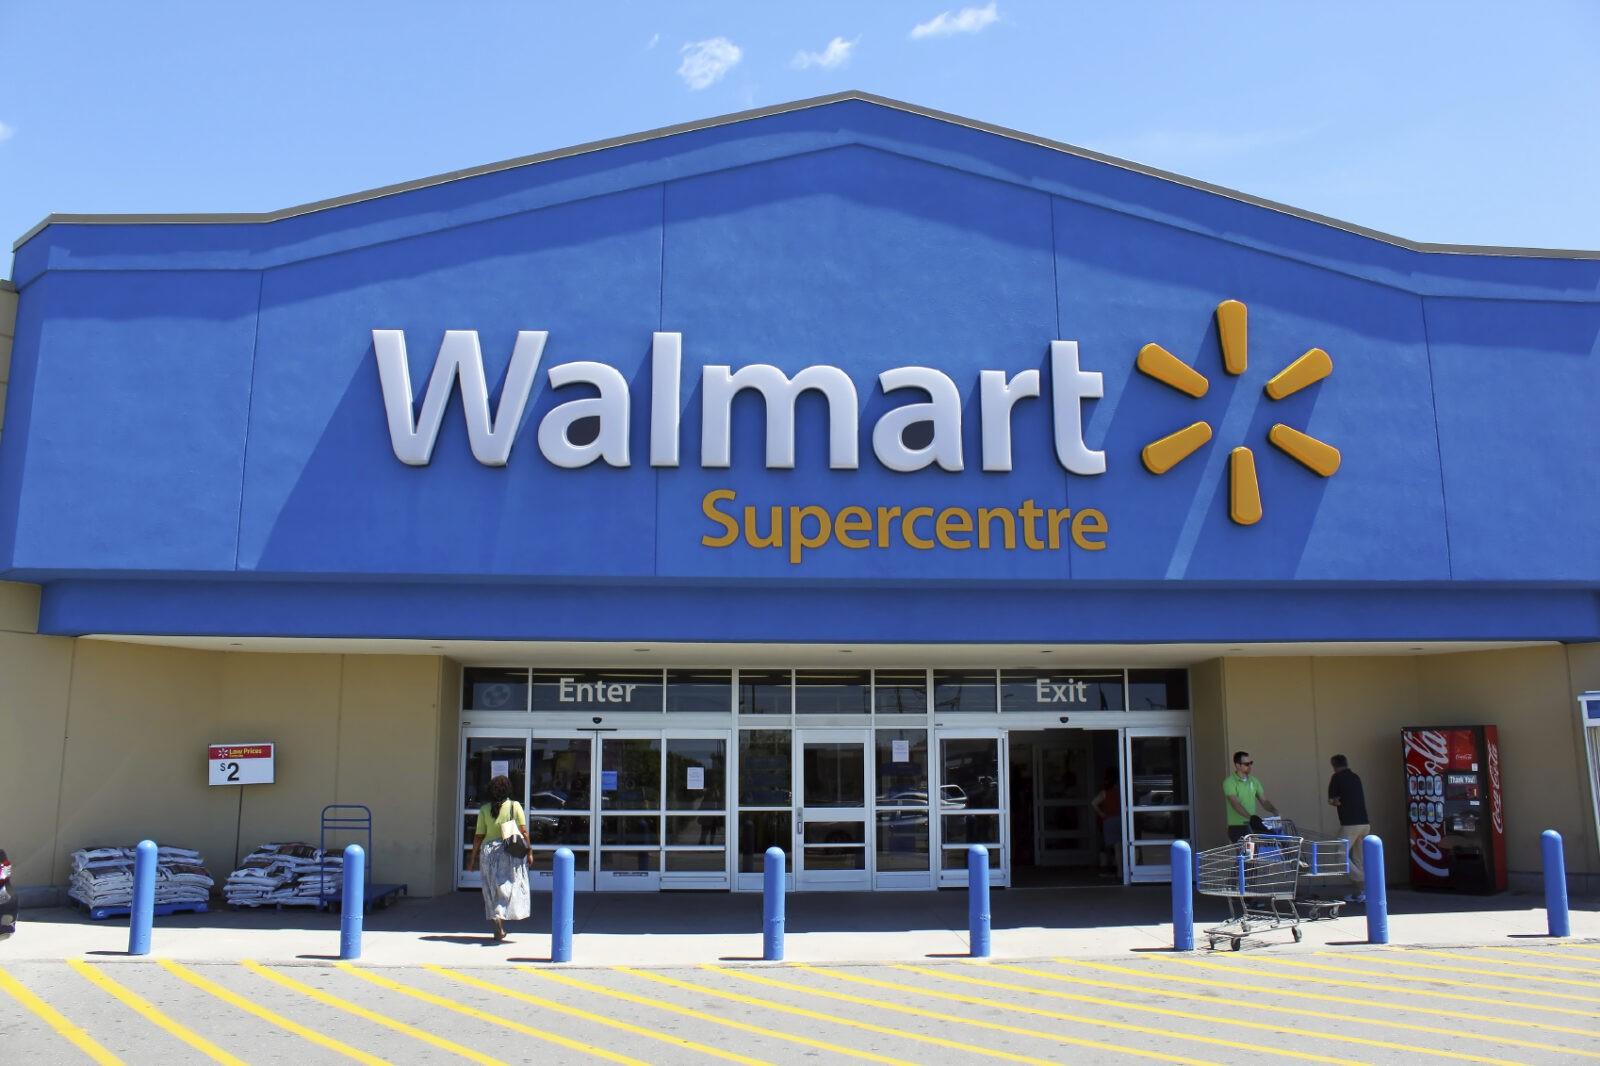 Walmart Supercentre storefront